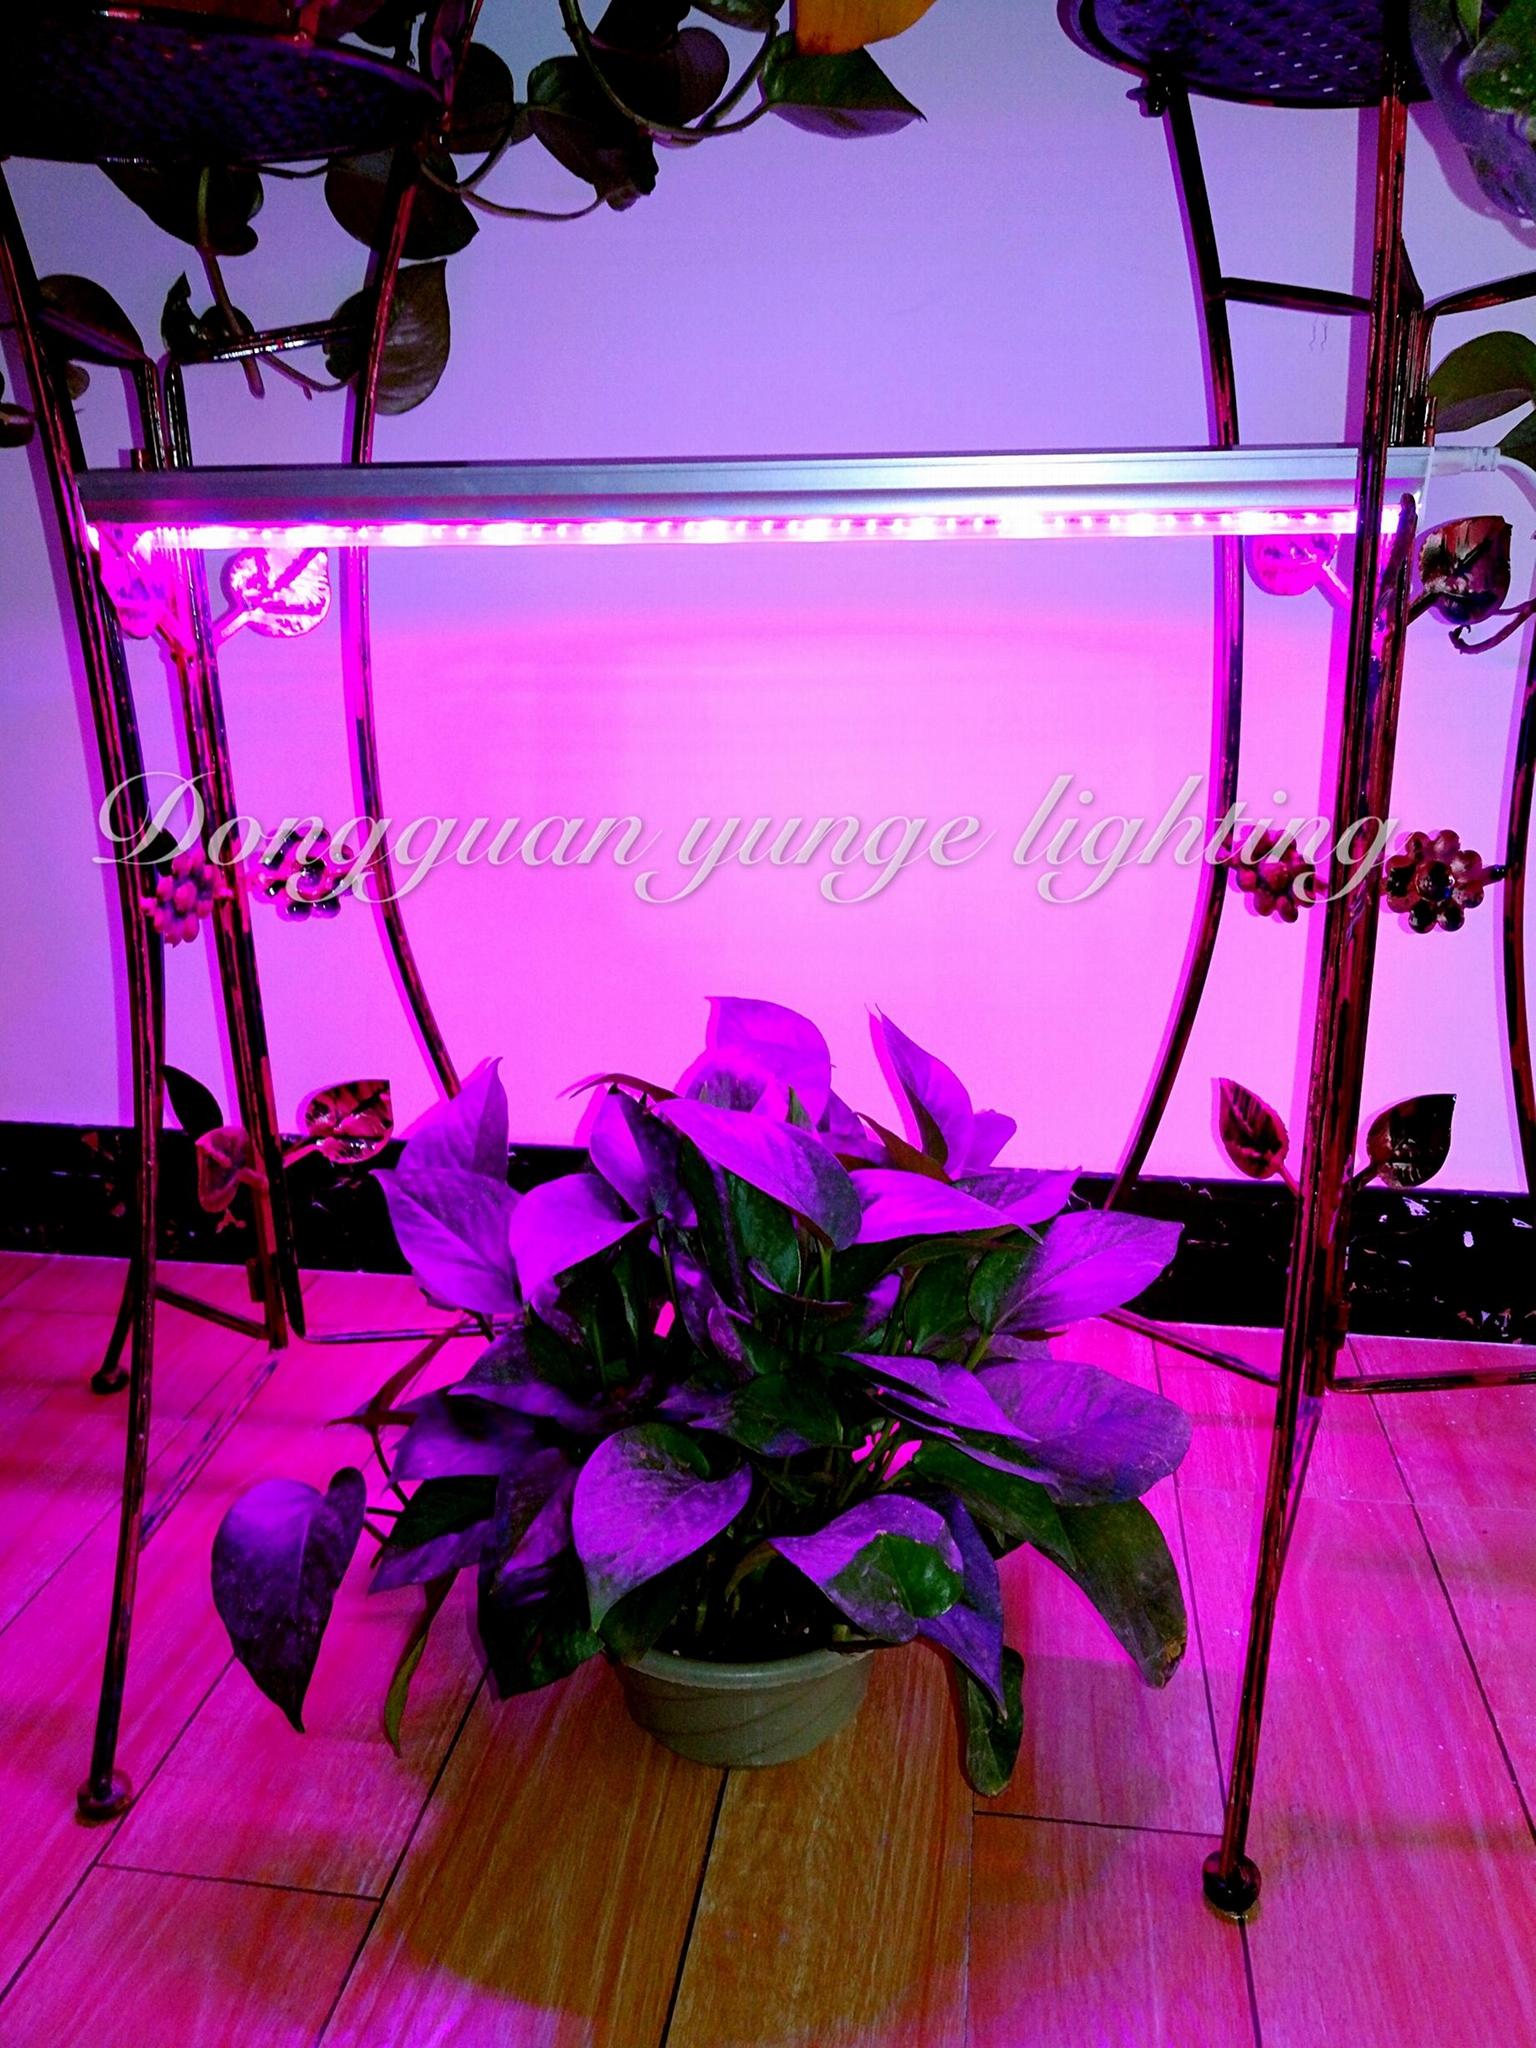 6W LED plant grow lamp,T5 tube grow light, Red blue light plant growth lamp. 1